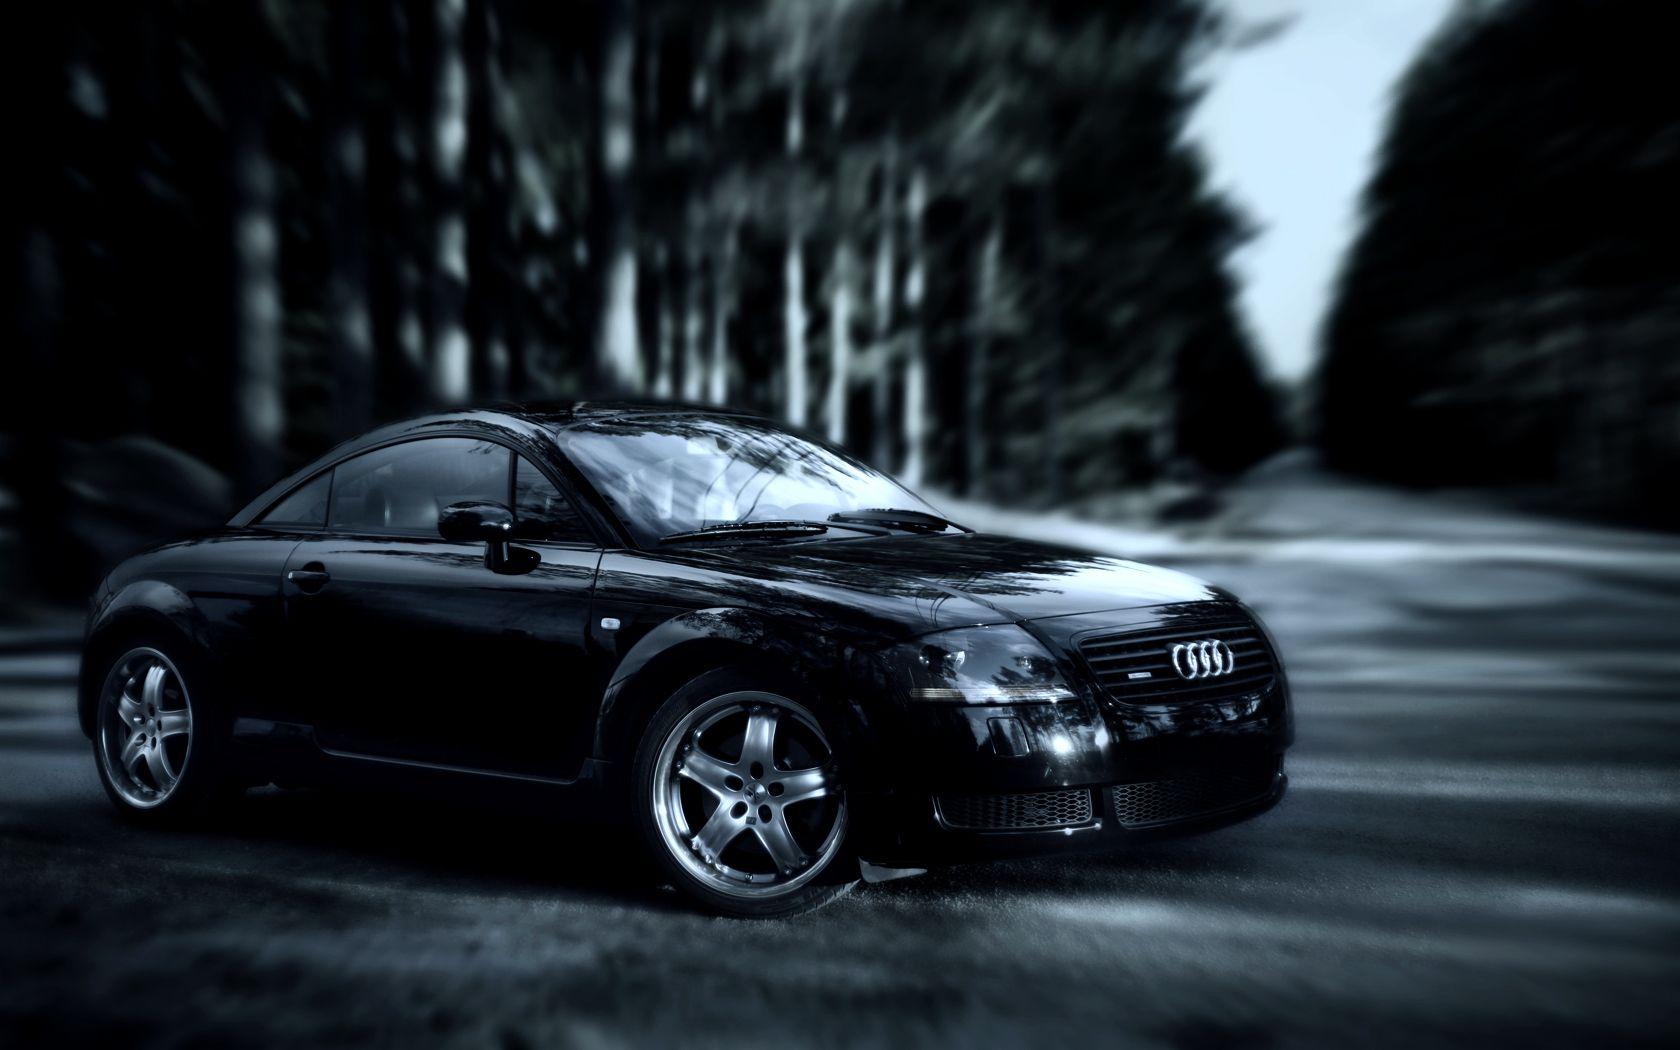 Black Audi Backgrounds   Audi tt, Black audi, Car photos